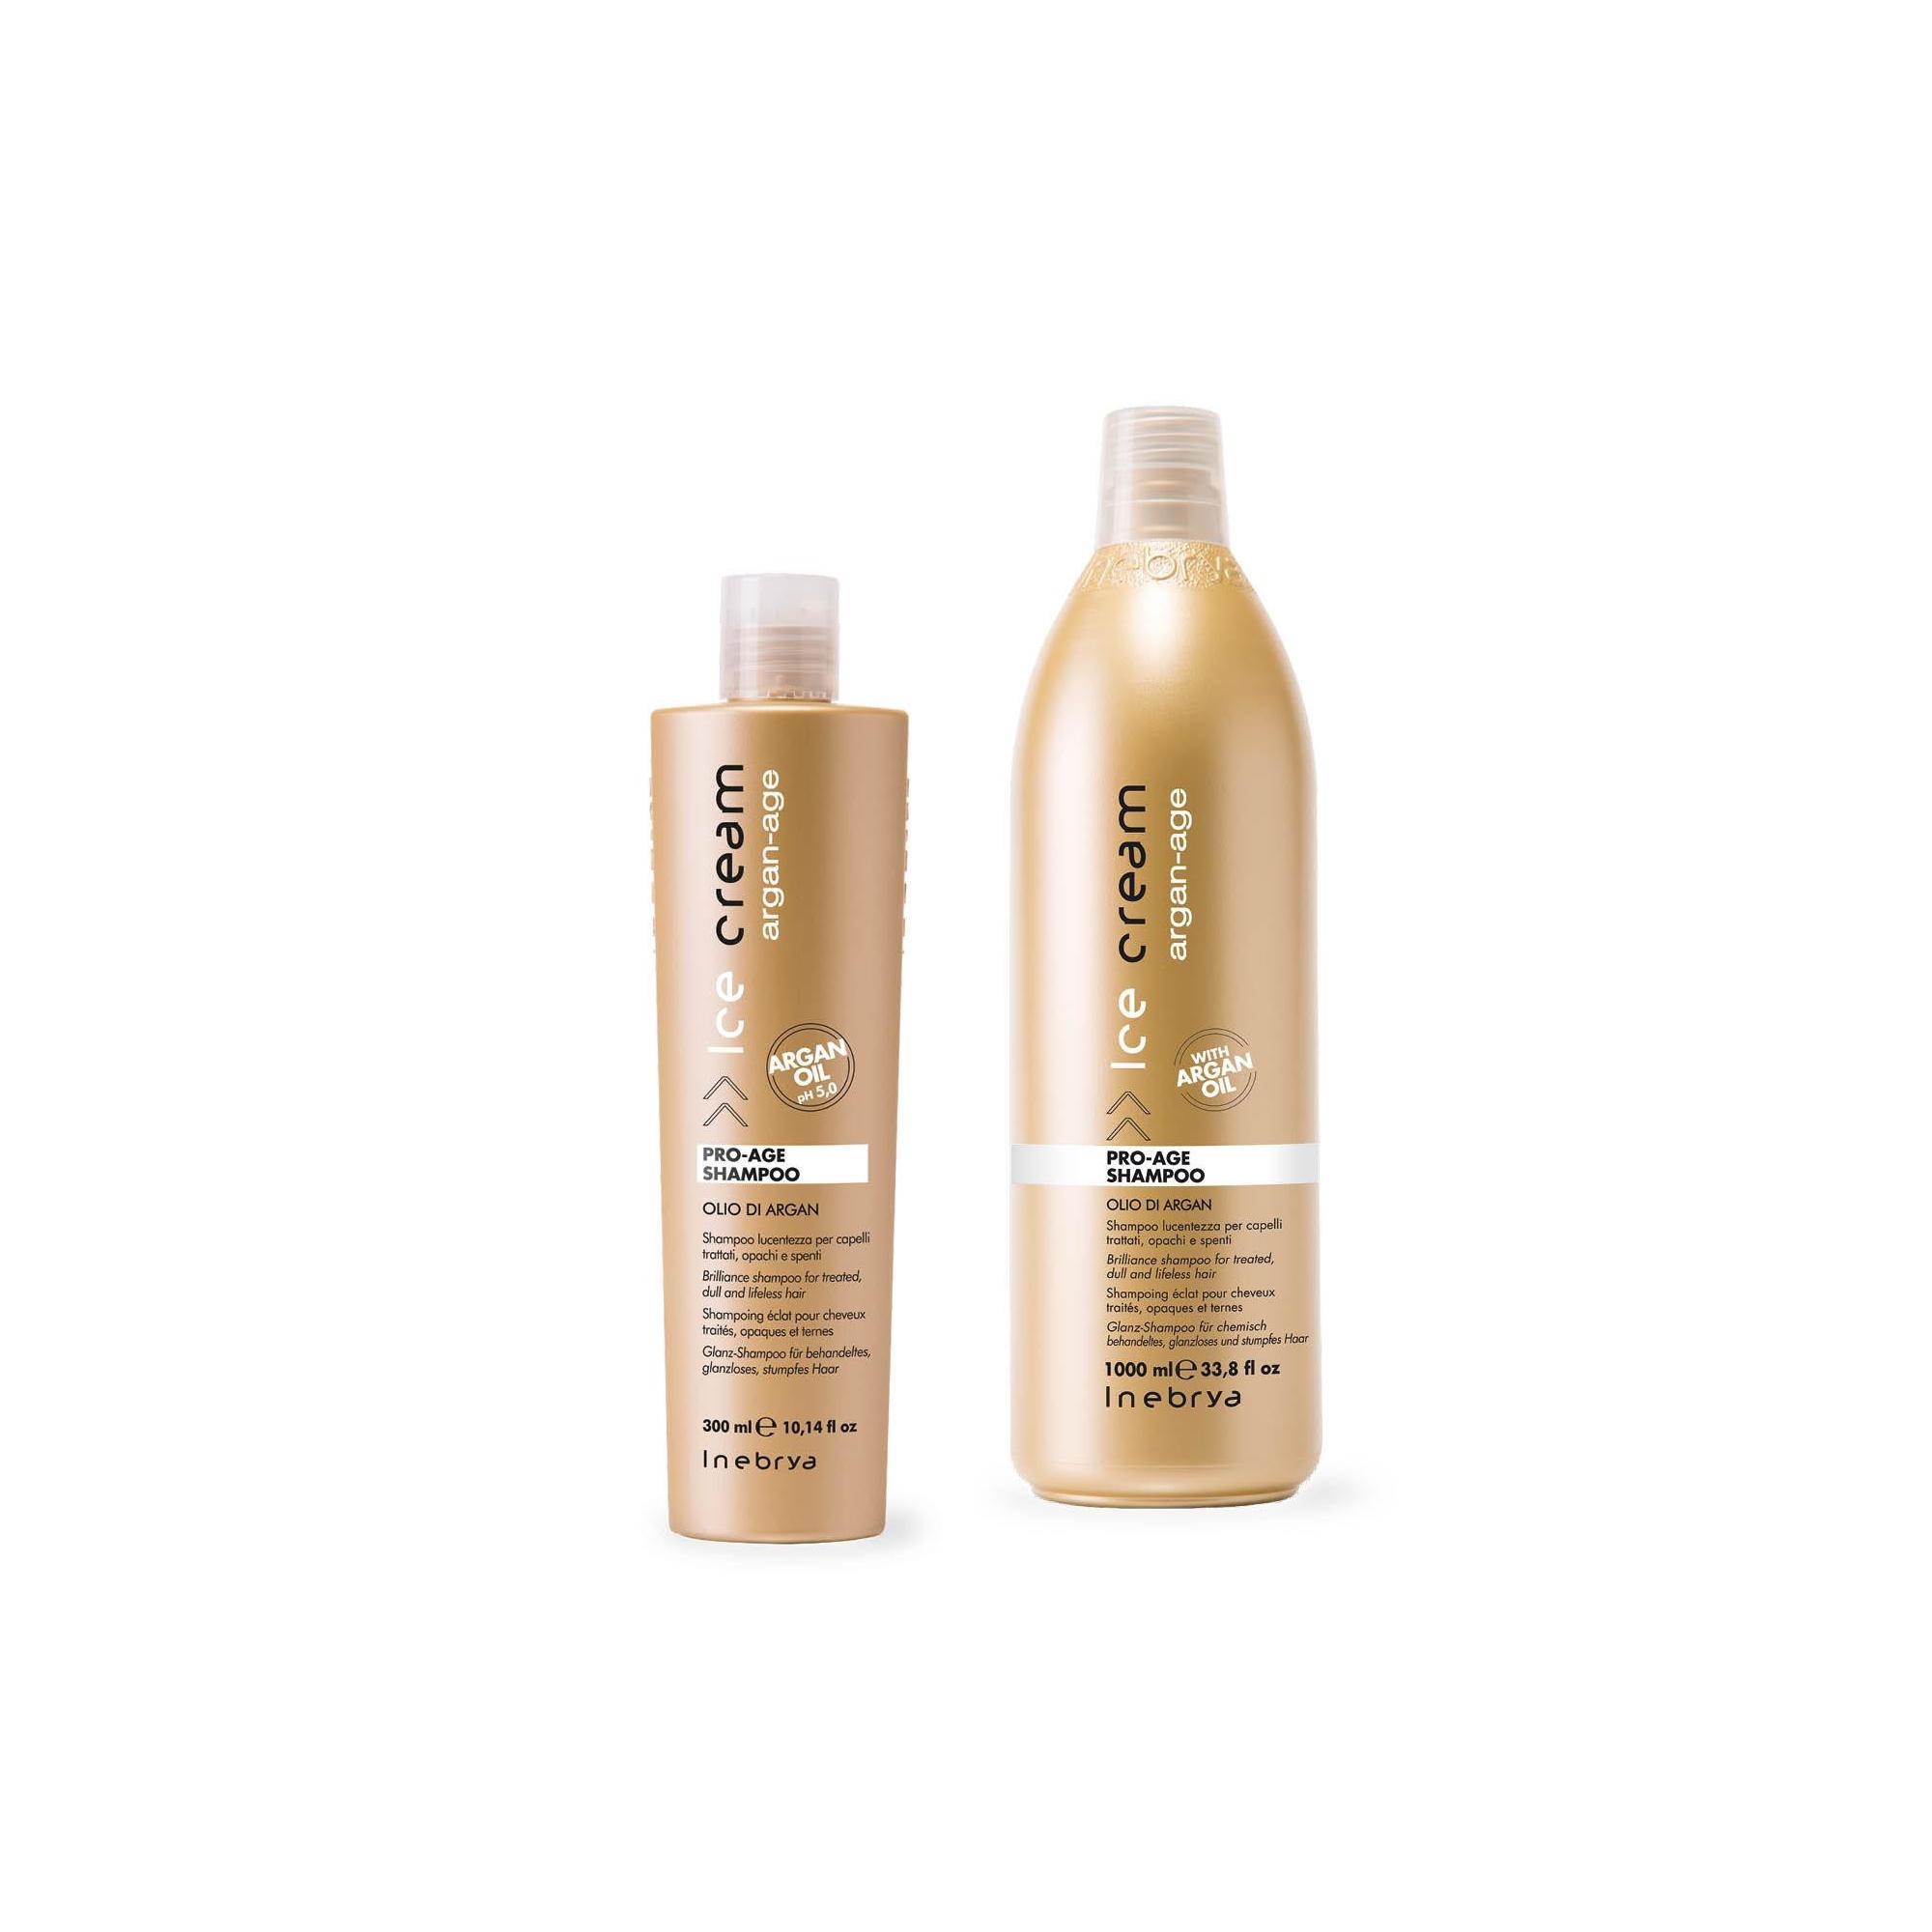 Inebrya Ice Cream Argan Age - Pro-Age shampoo 1000 ml